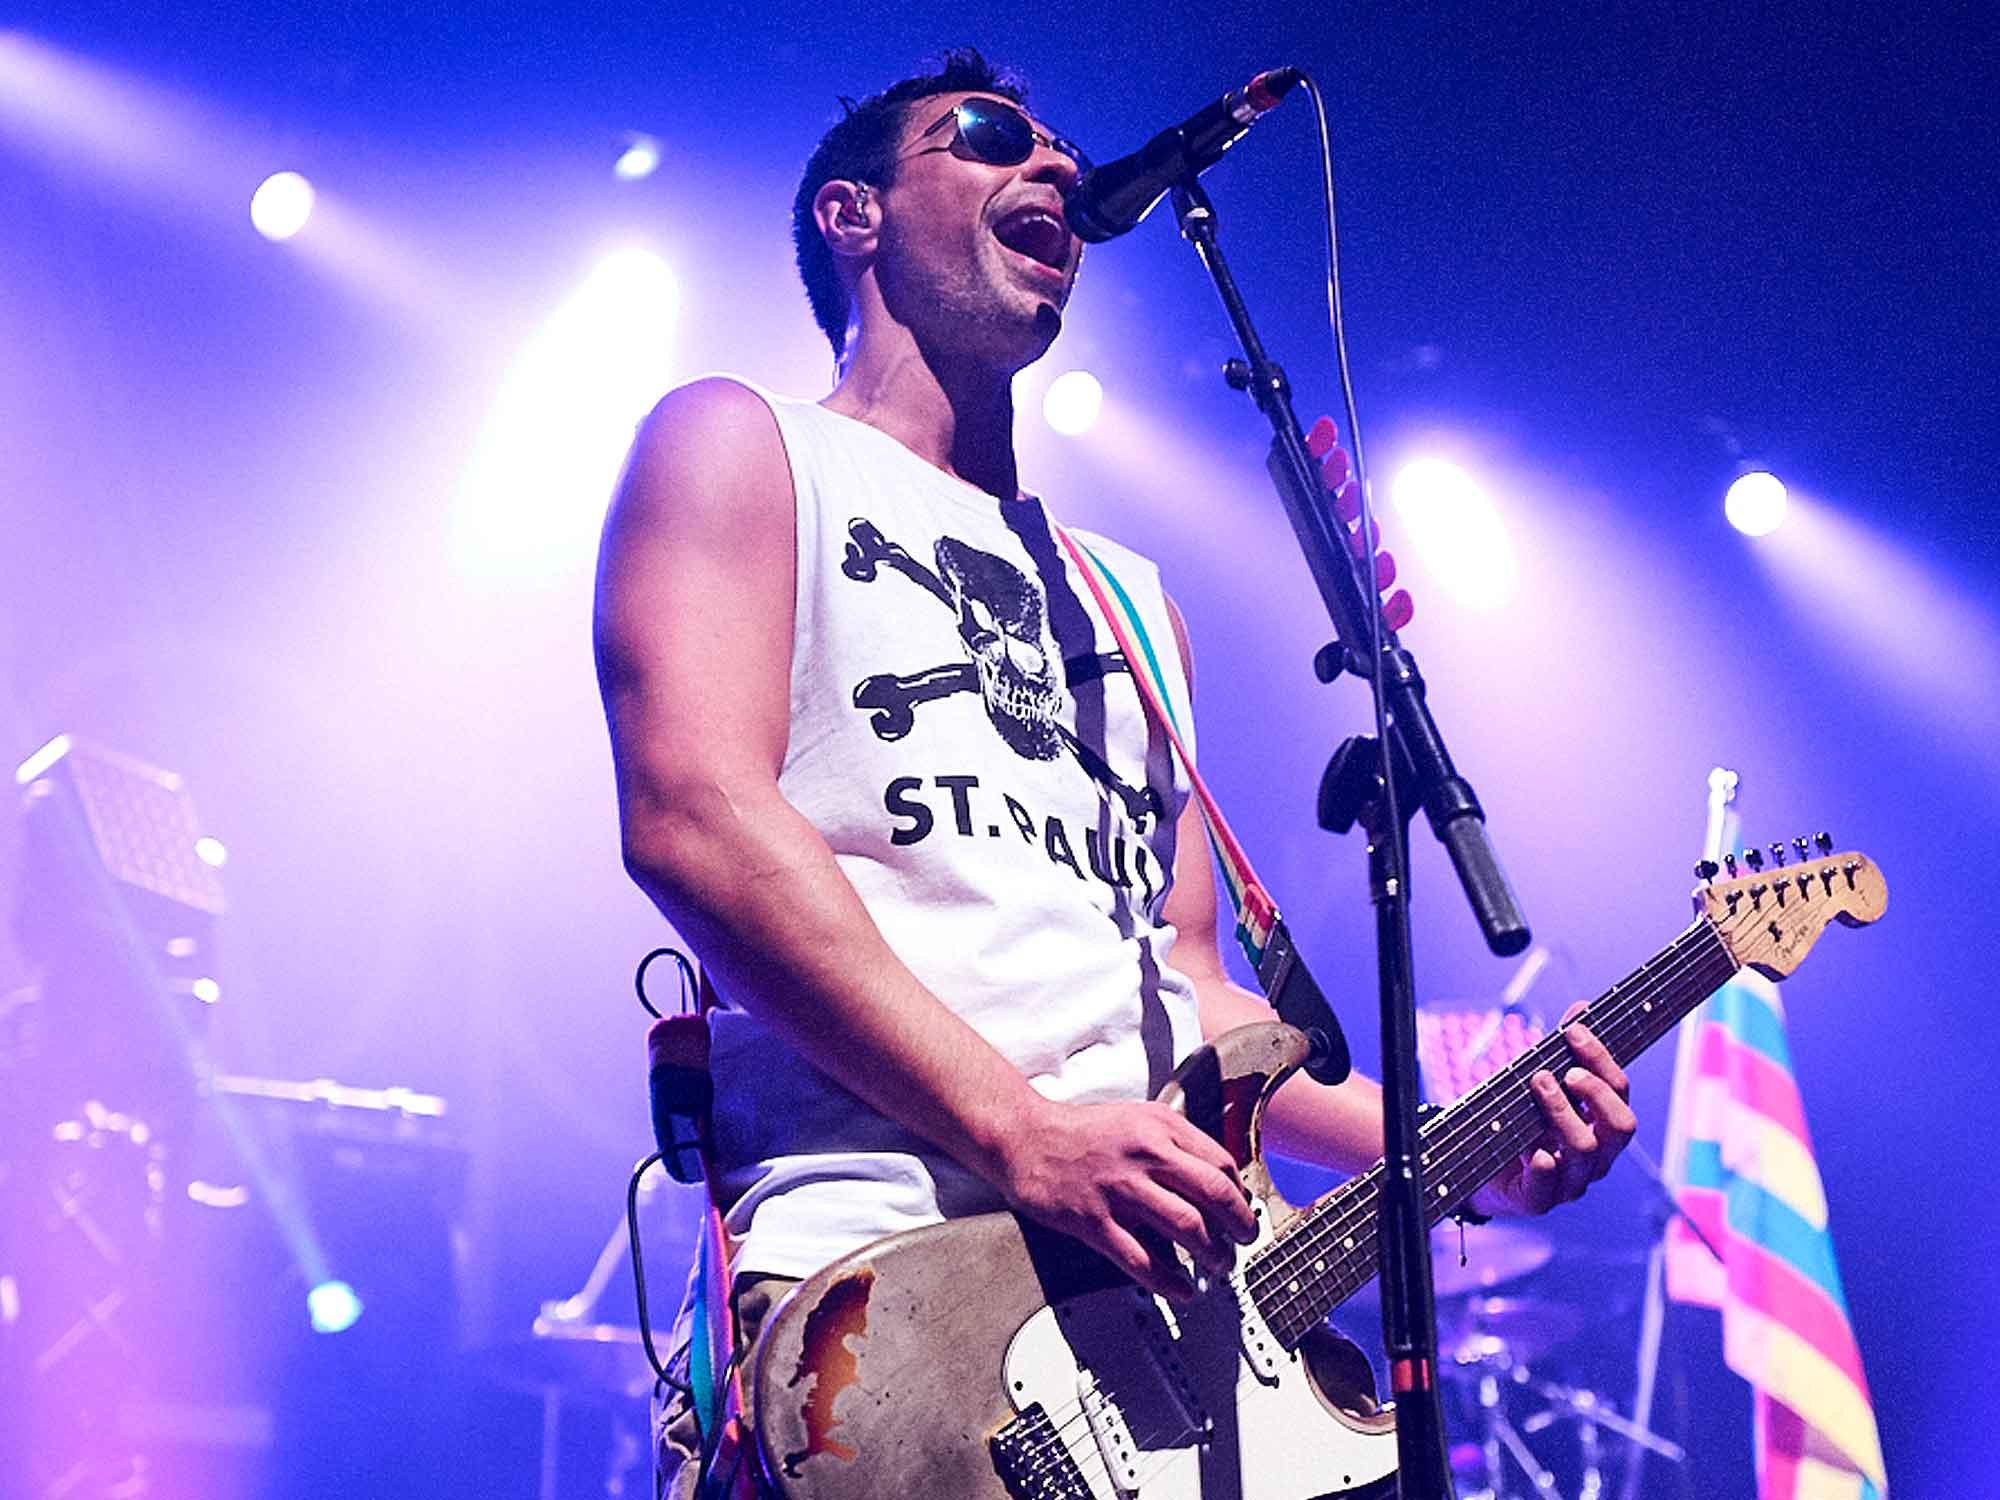 Rock'n'Roll Football – St. Pauli auf Tour mit Pepper und Less Than Jake